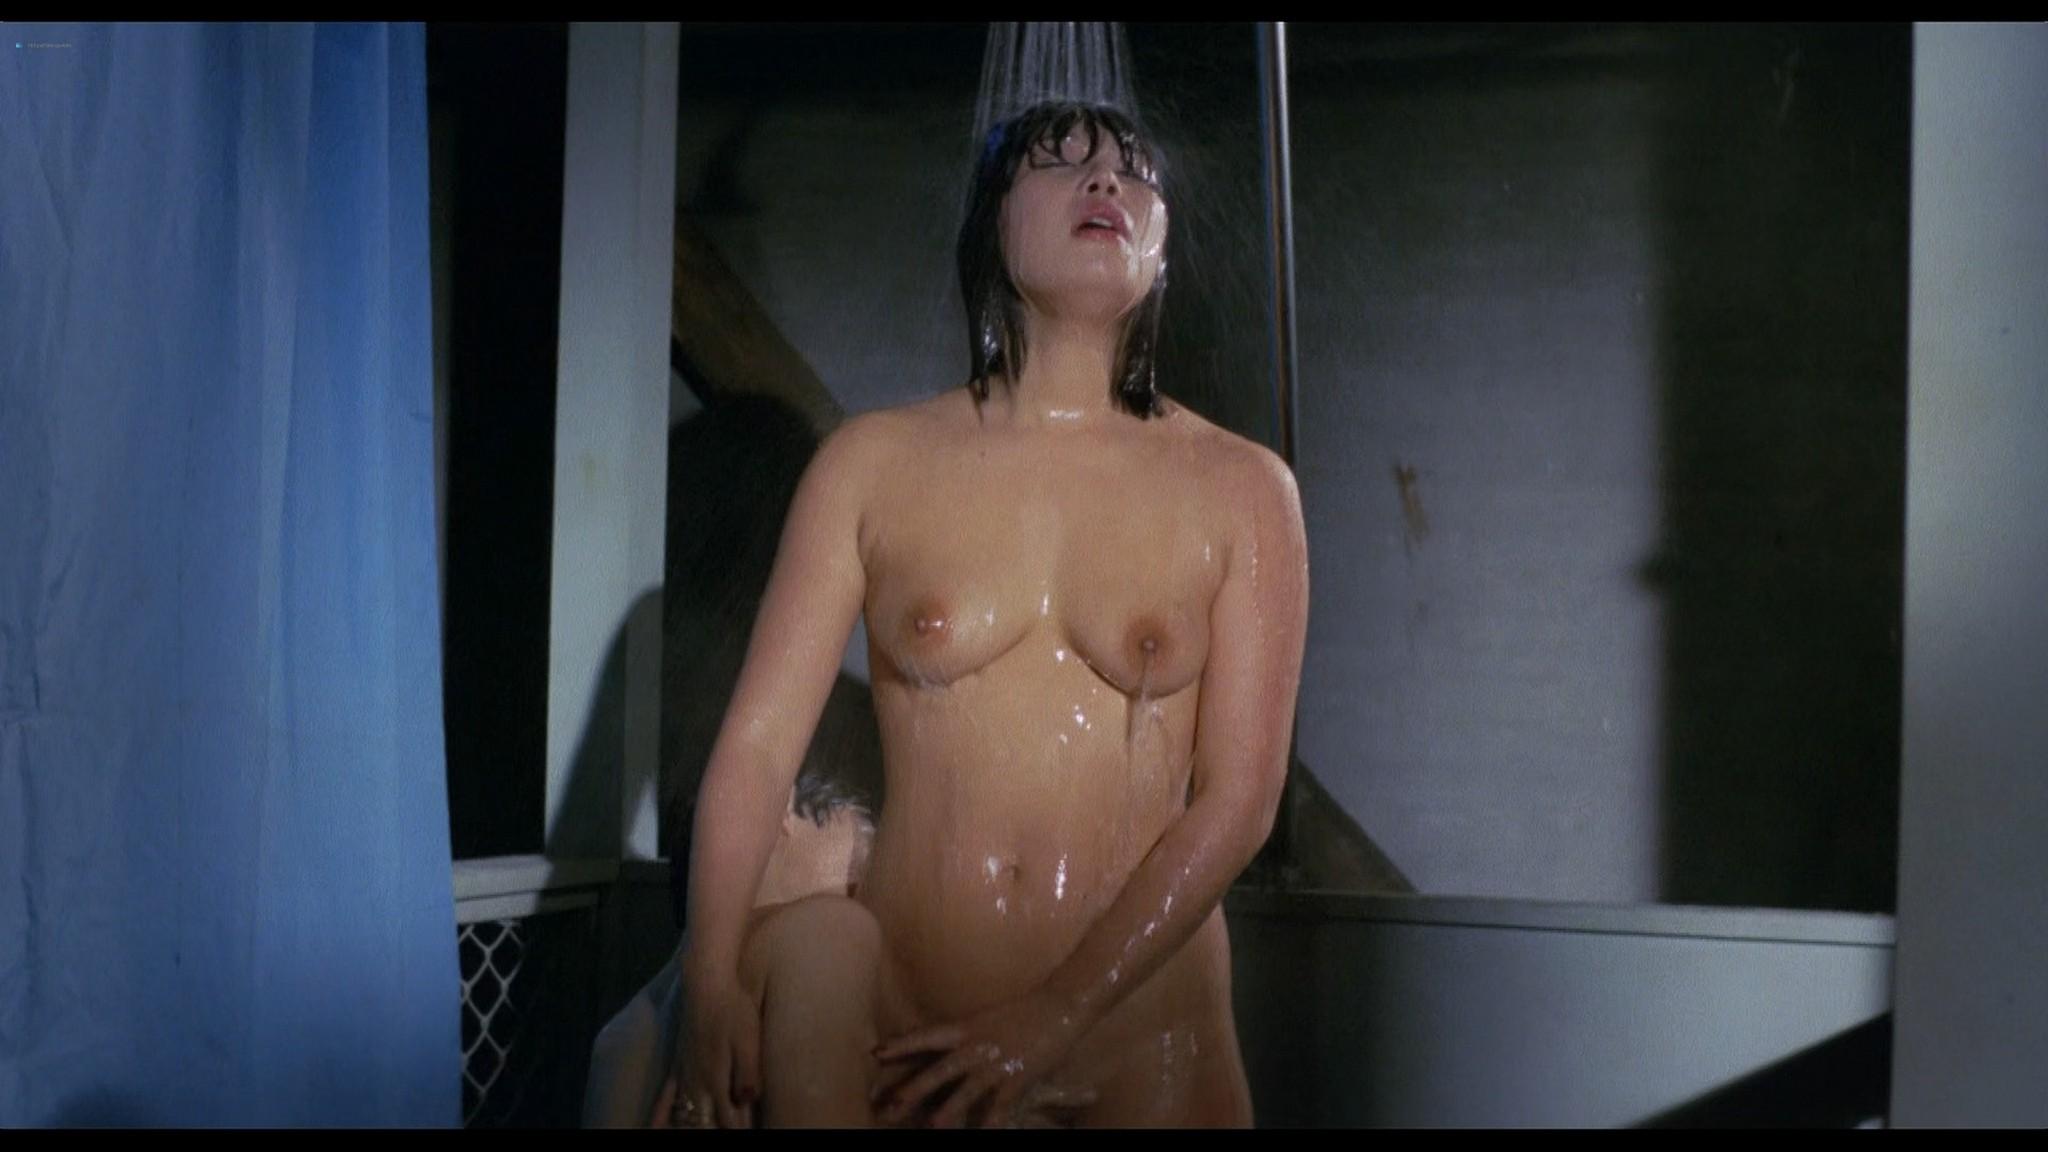 Natsuko Yamamoto nude Kaoru Oda nude lot of sex Beautiful Wrestlers Down for the Count JP 1984 1080p BluRay REMUX 9